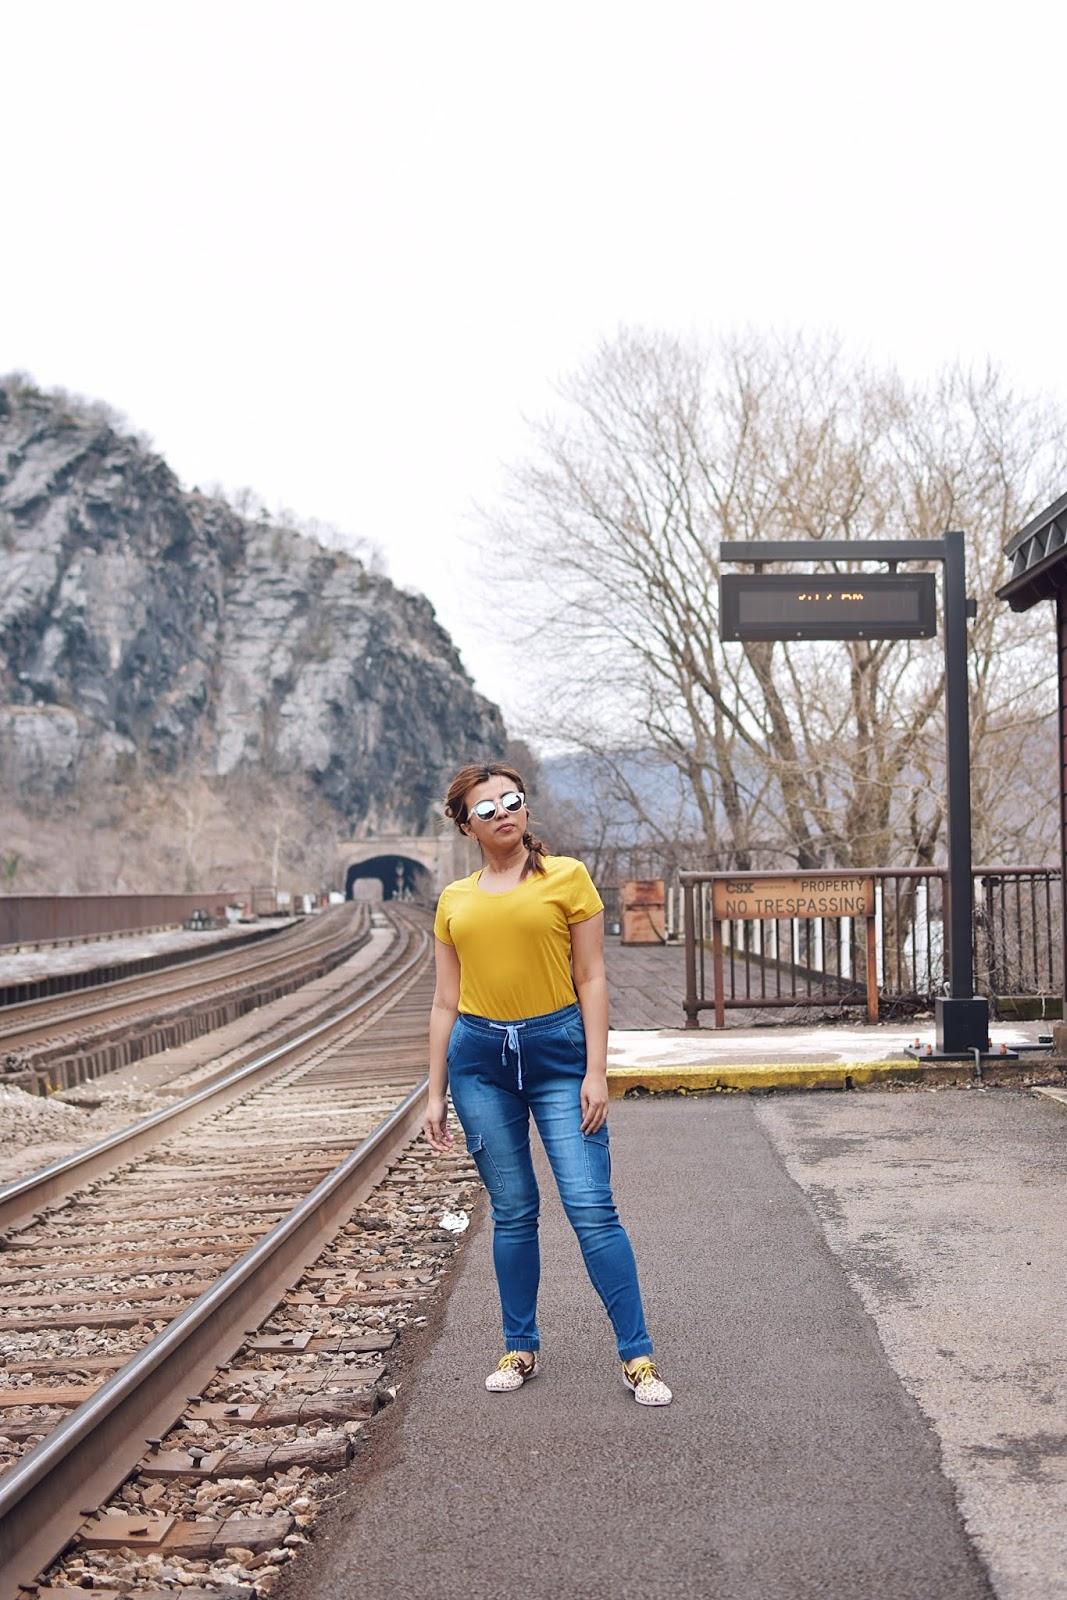 Skinny Jogger Pants - Neon Vibes-mom jeans-lookbook-fashionblogger-dcblogger-travelblogger-west virginia-harpers ferry-viajeros en internet-bloggerstyle-